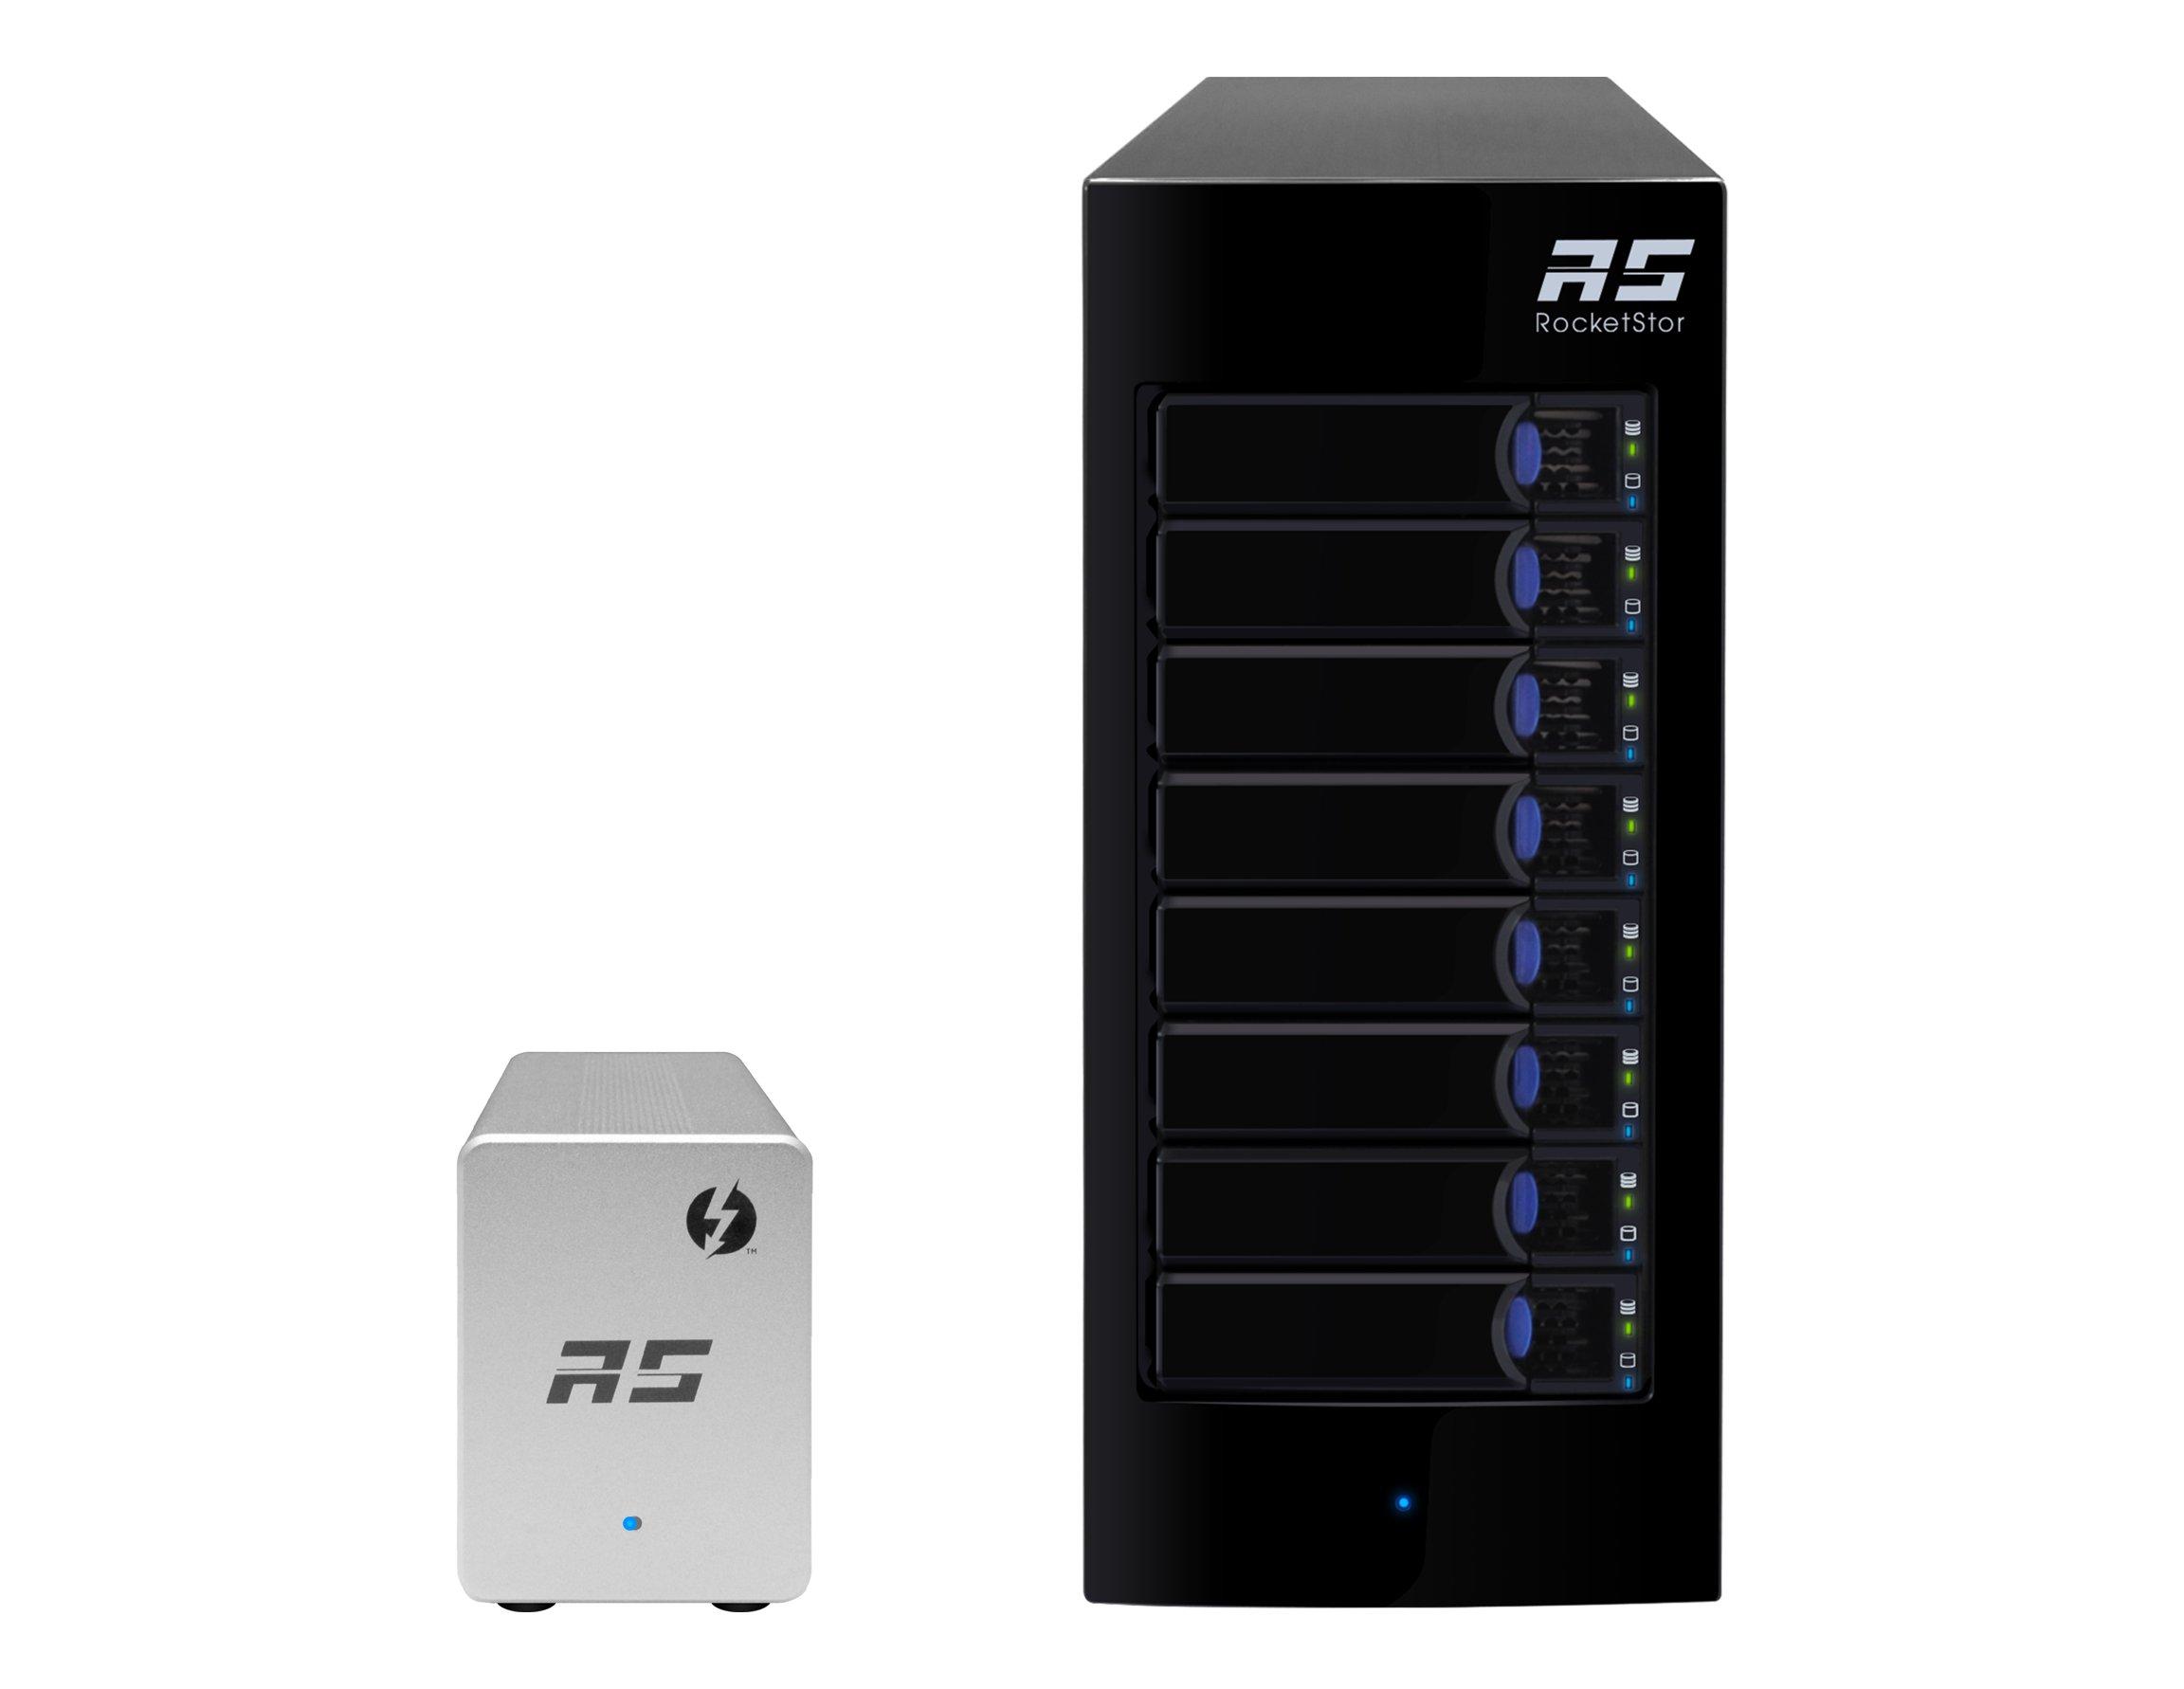 HighPoint RocketStor 6328LS 8-Bay Thunderbolt 2 Diskless SATA JBOD Storage Solution